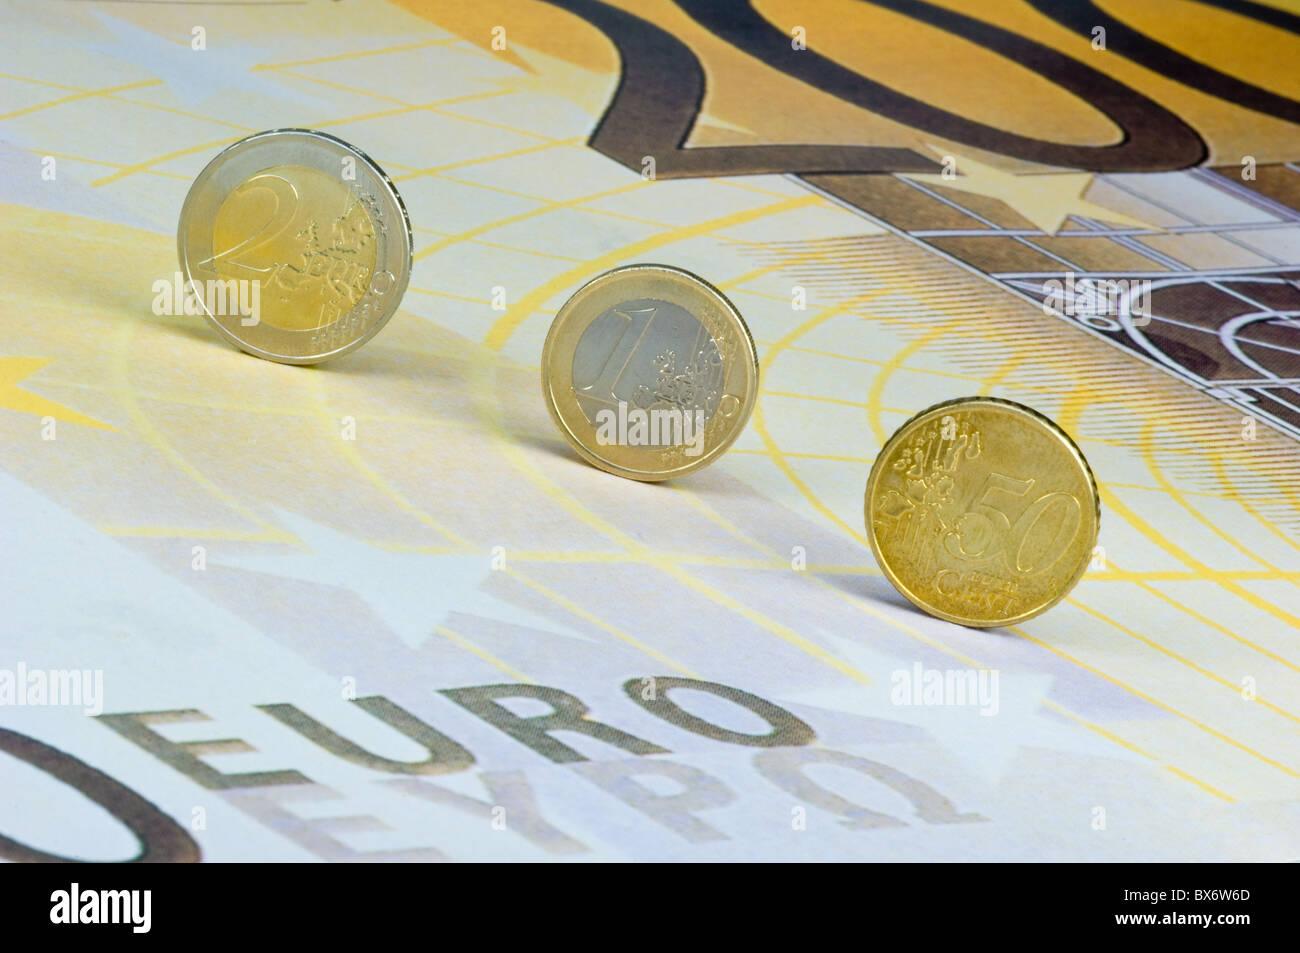 European Hardcash - Stock Image